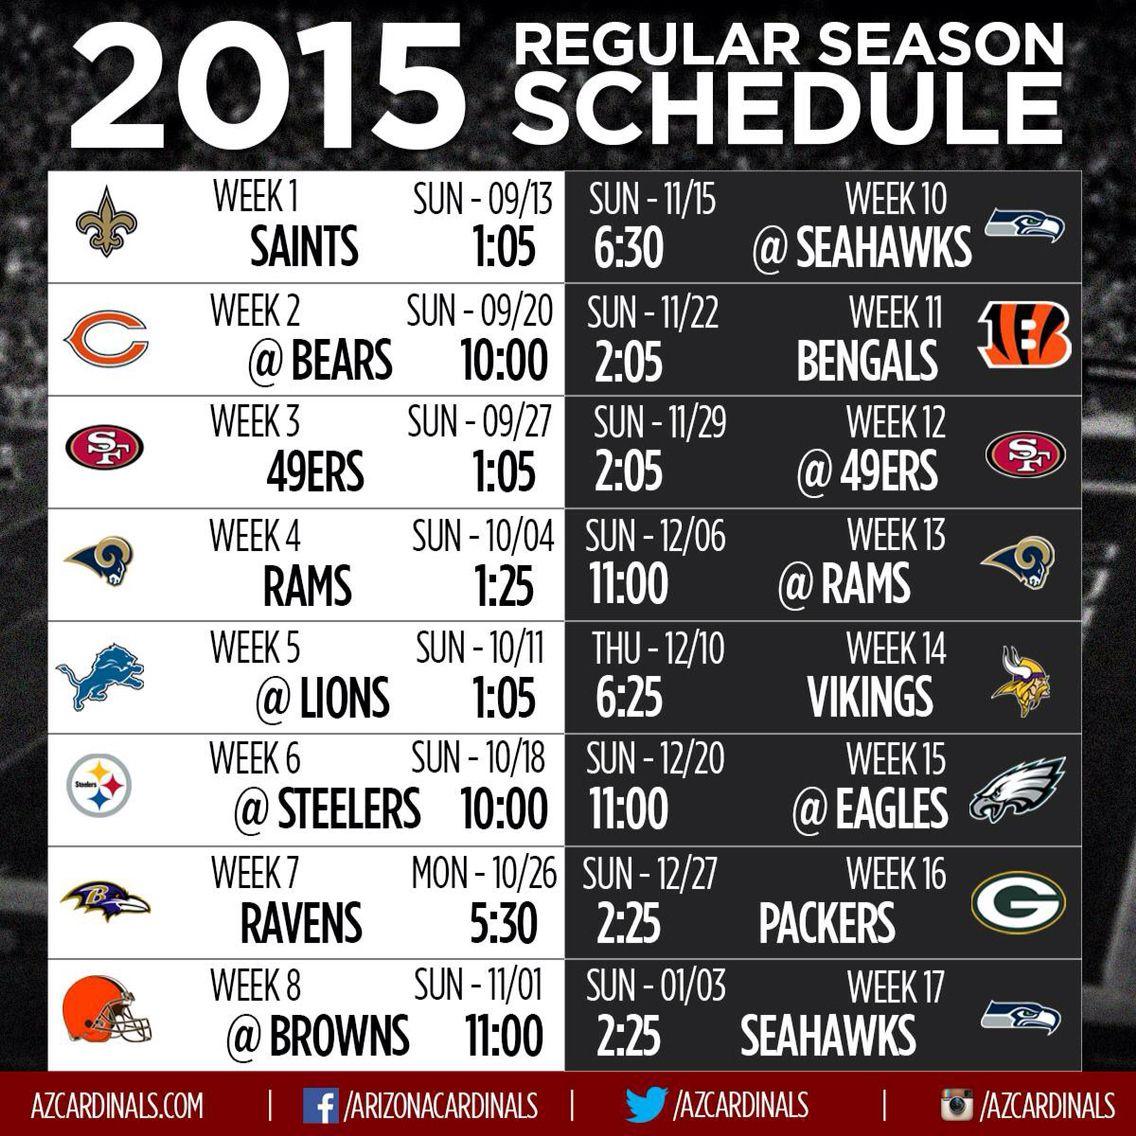 Arizona Cardinals 2015 regular season! Let's go bigred